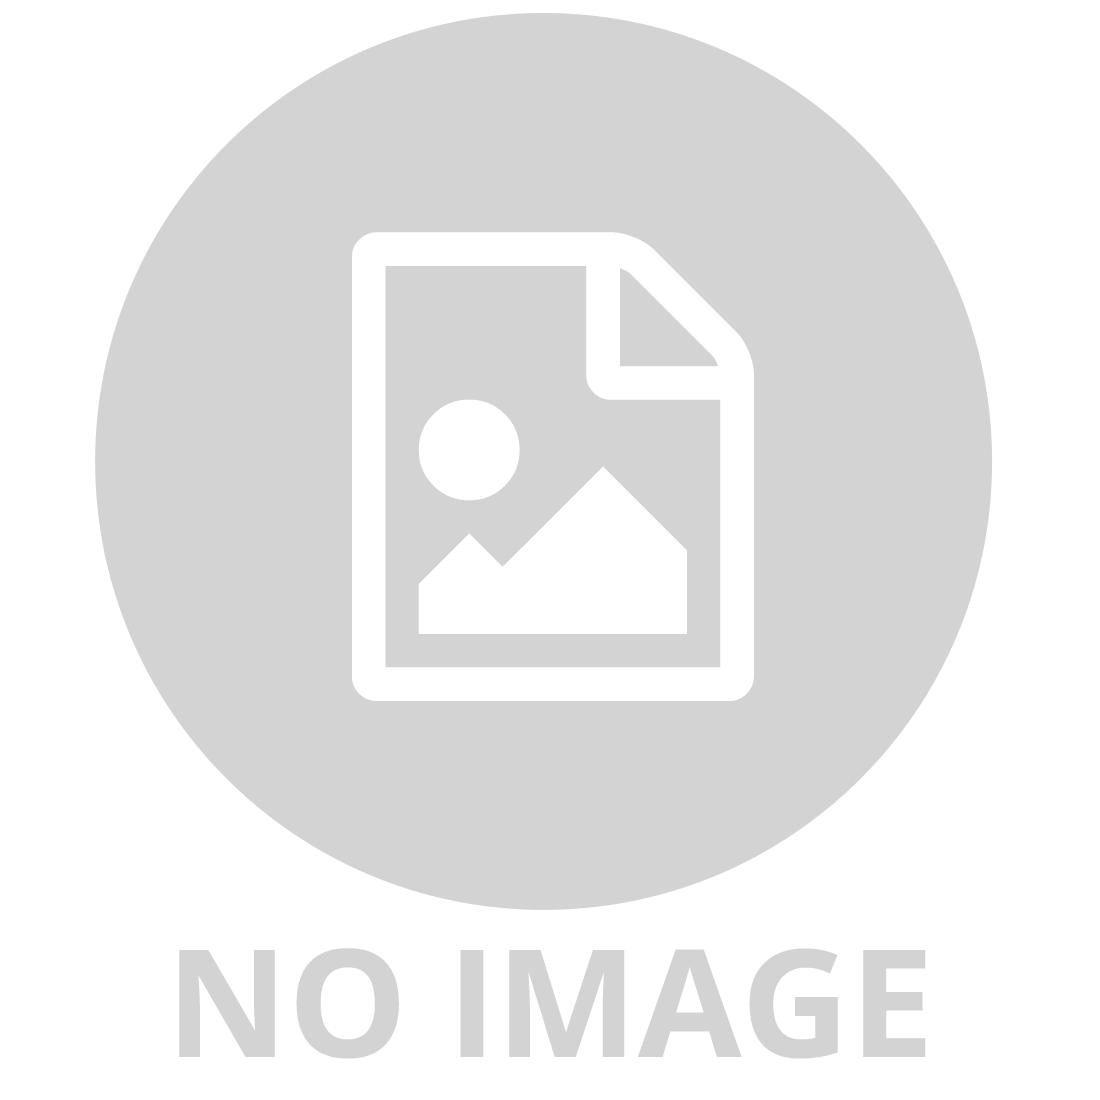 CLEMENTONI CHEMISTRY SET 200